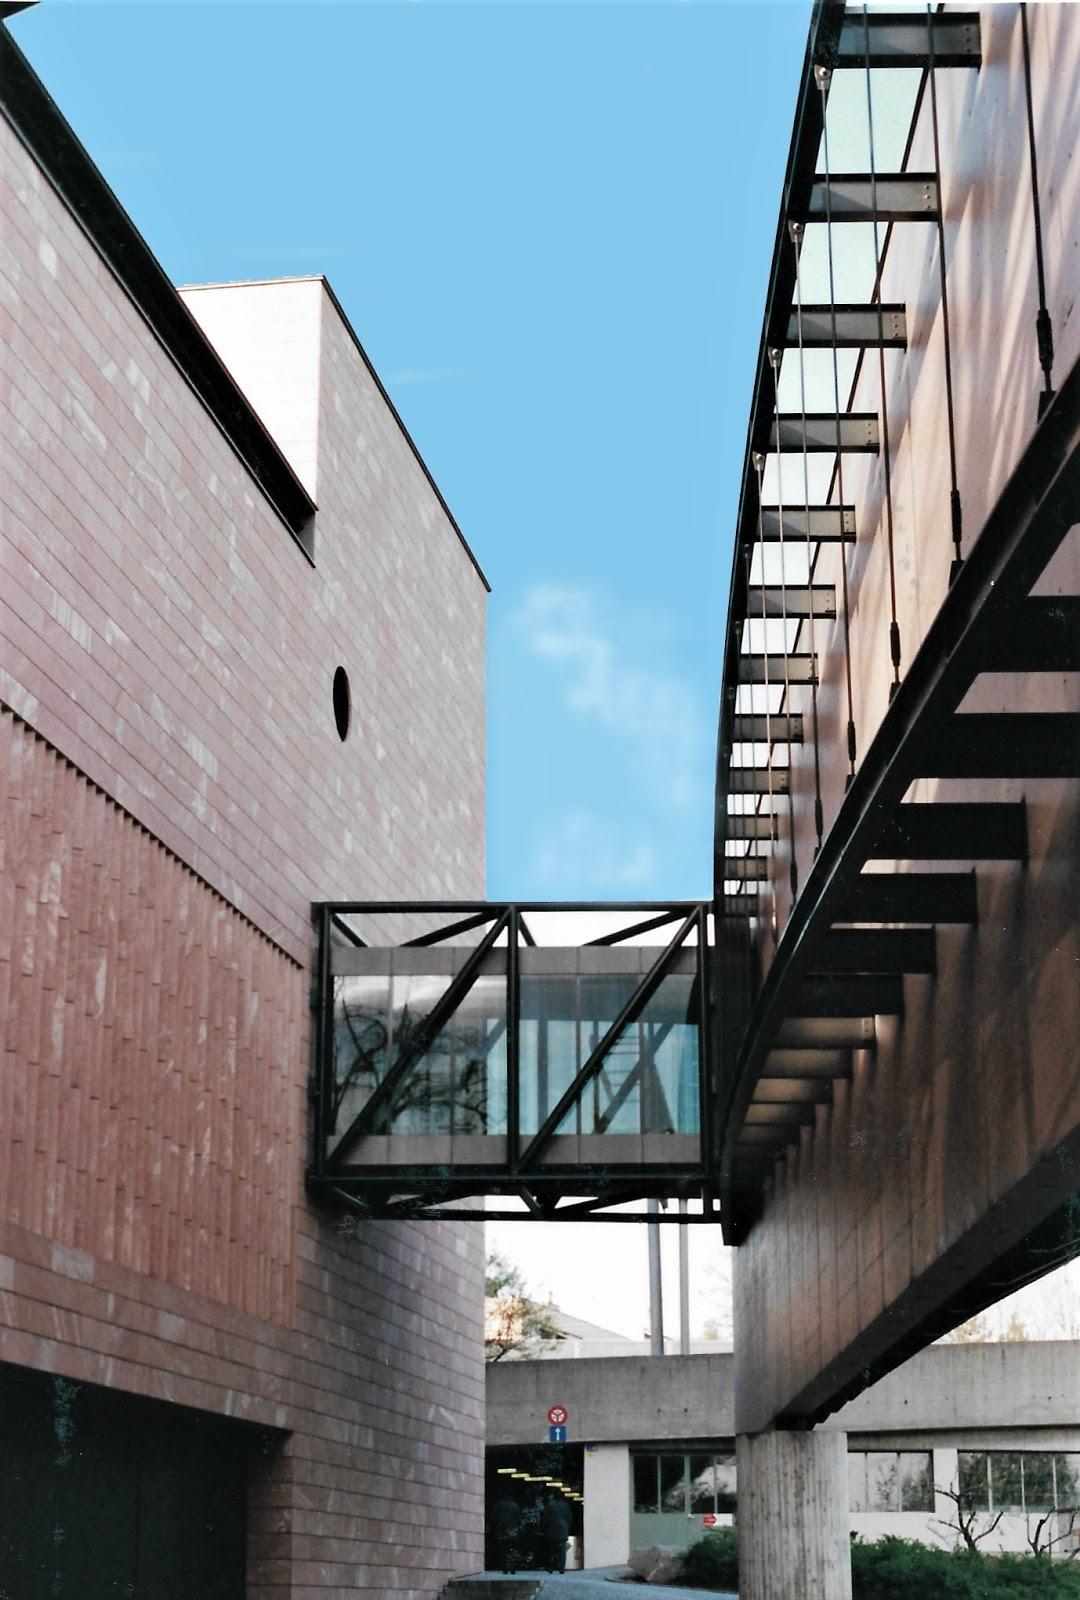 Basilea Museo Tinguely